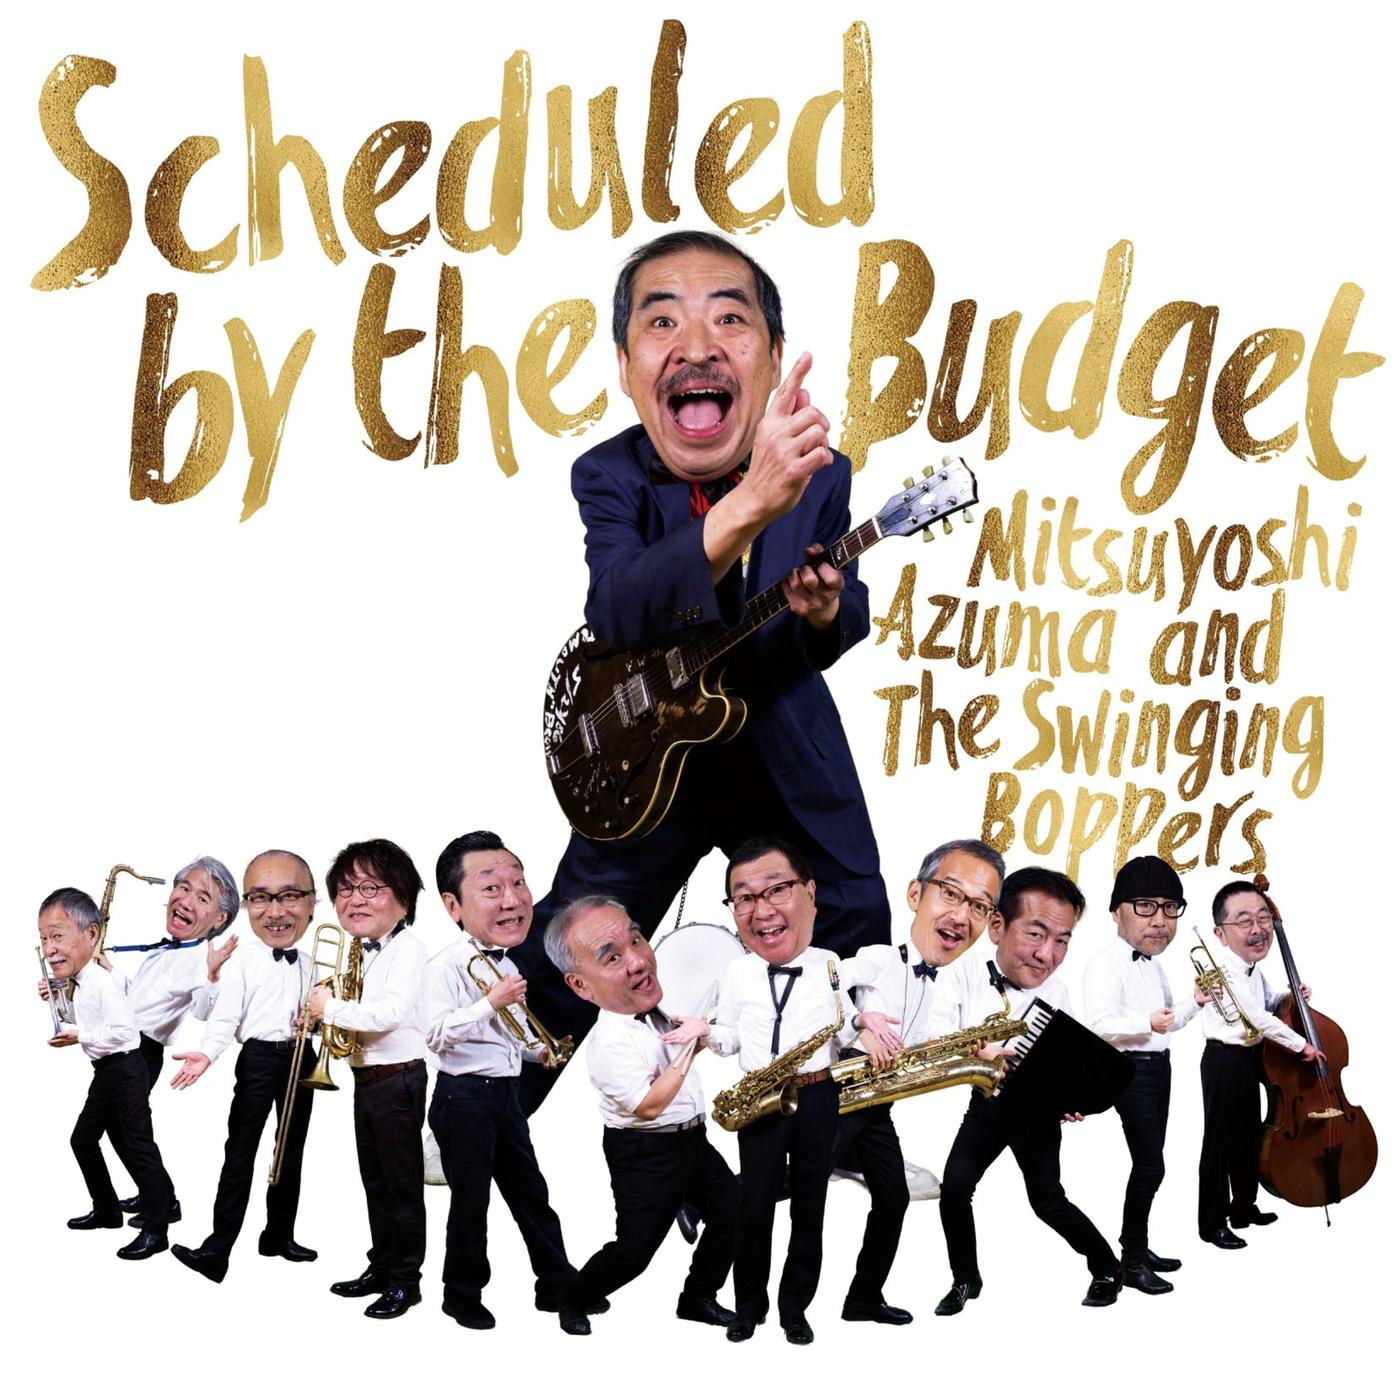 Scheduled by the Budget - Mitsuyoshi Azuma